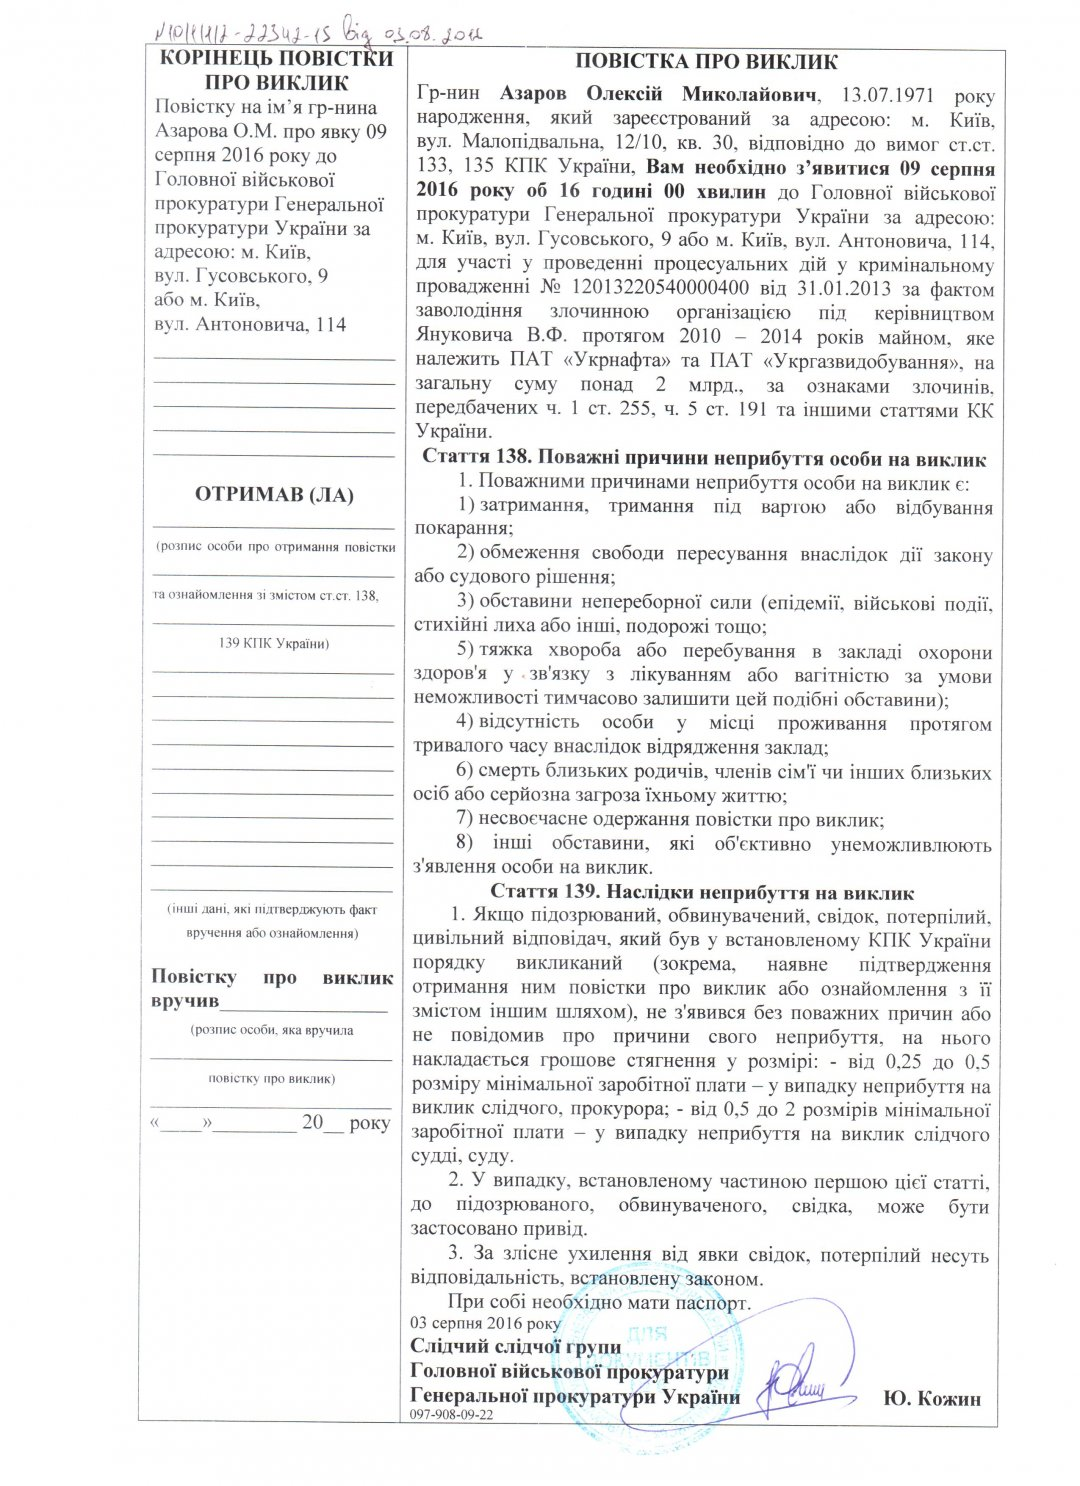 повестка Азарова в ГПУ